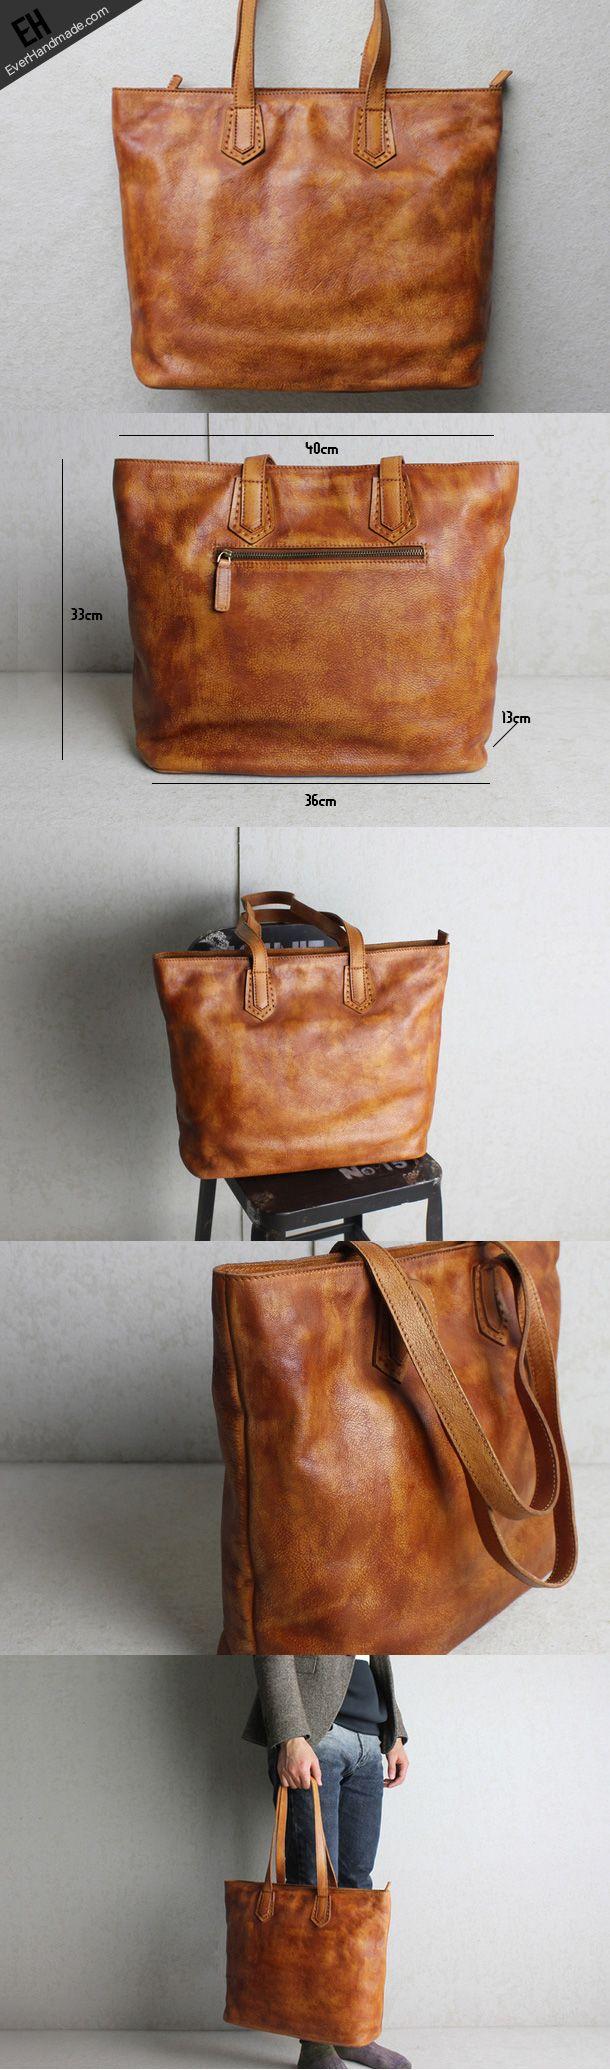 Handmade brown leather brown tote bag Large